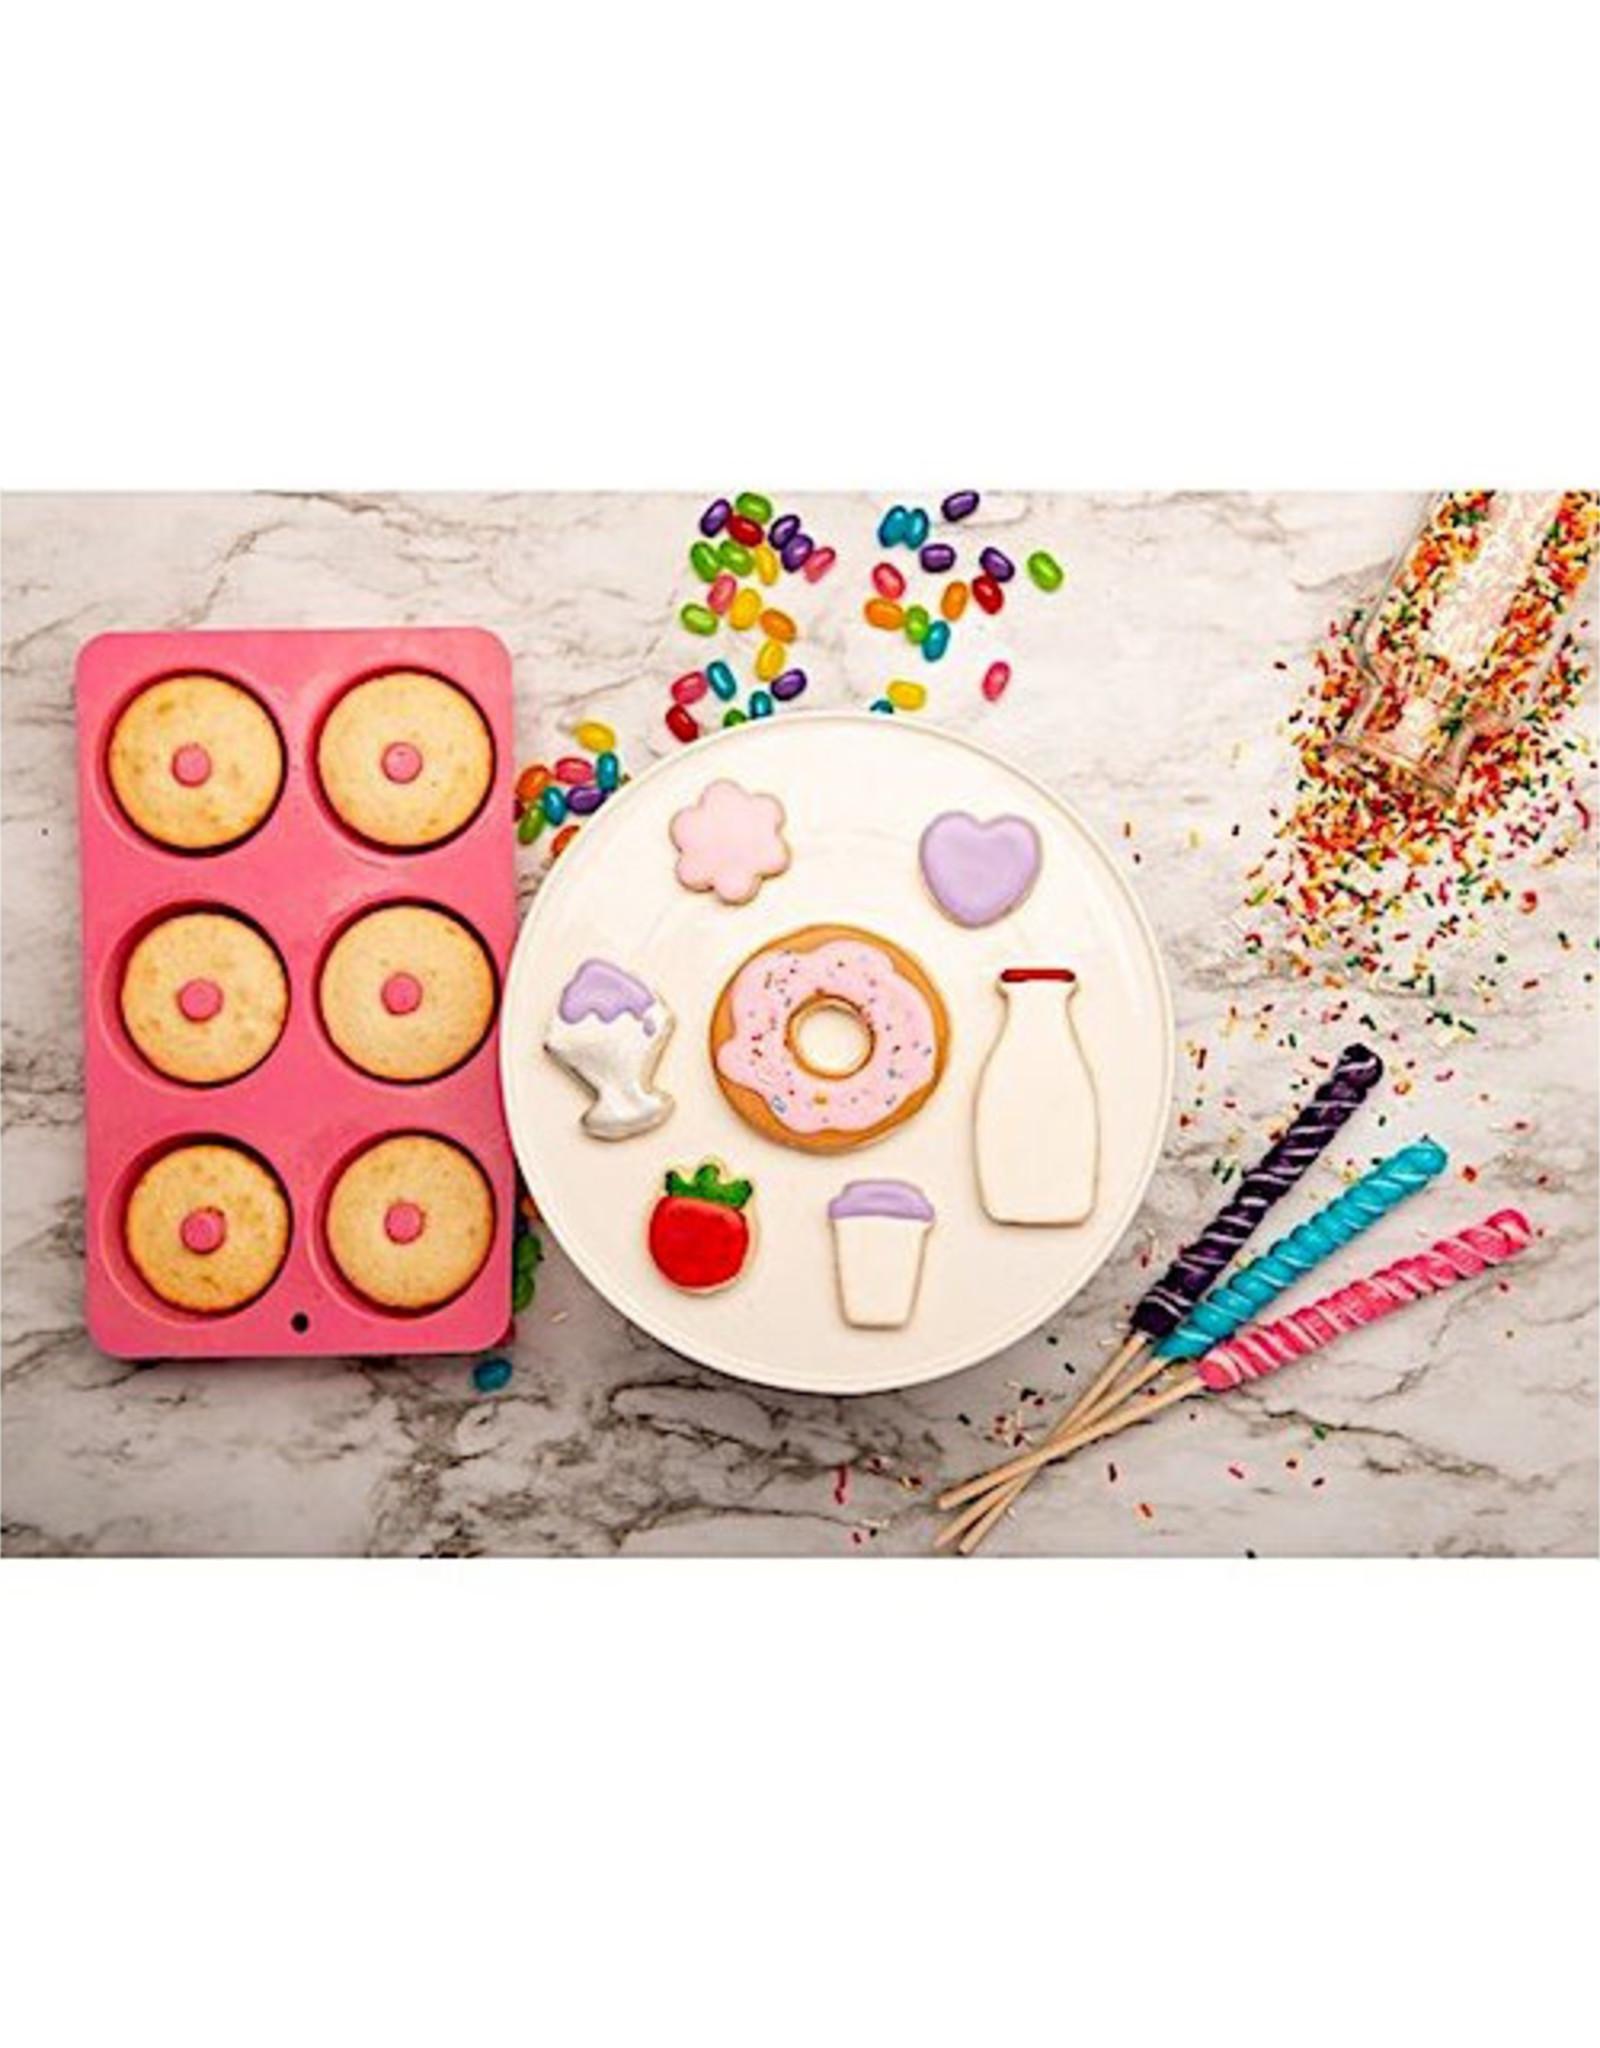 Handstand Kitchen Ultimate Donut Shoppe Baking Party Set